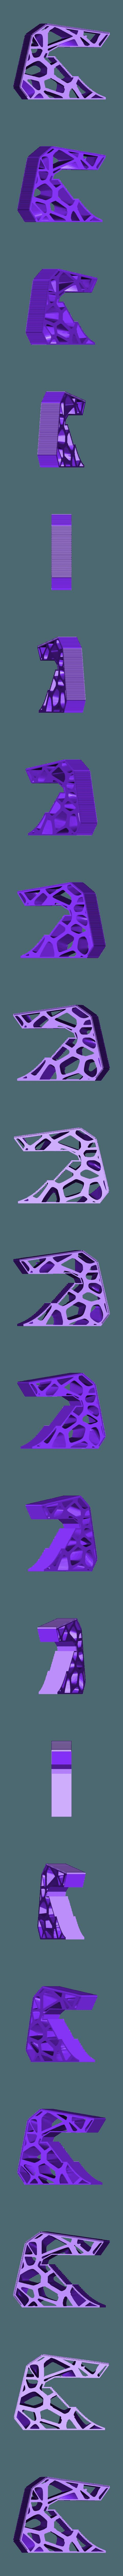 architecture example 4.stl Download STL file 3D printable architectural exhibition model 04 • 3D printer template, euroreprap_eu